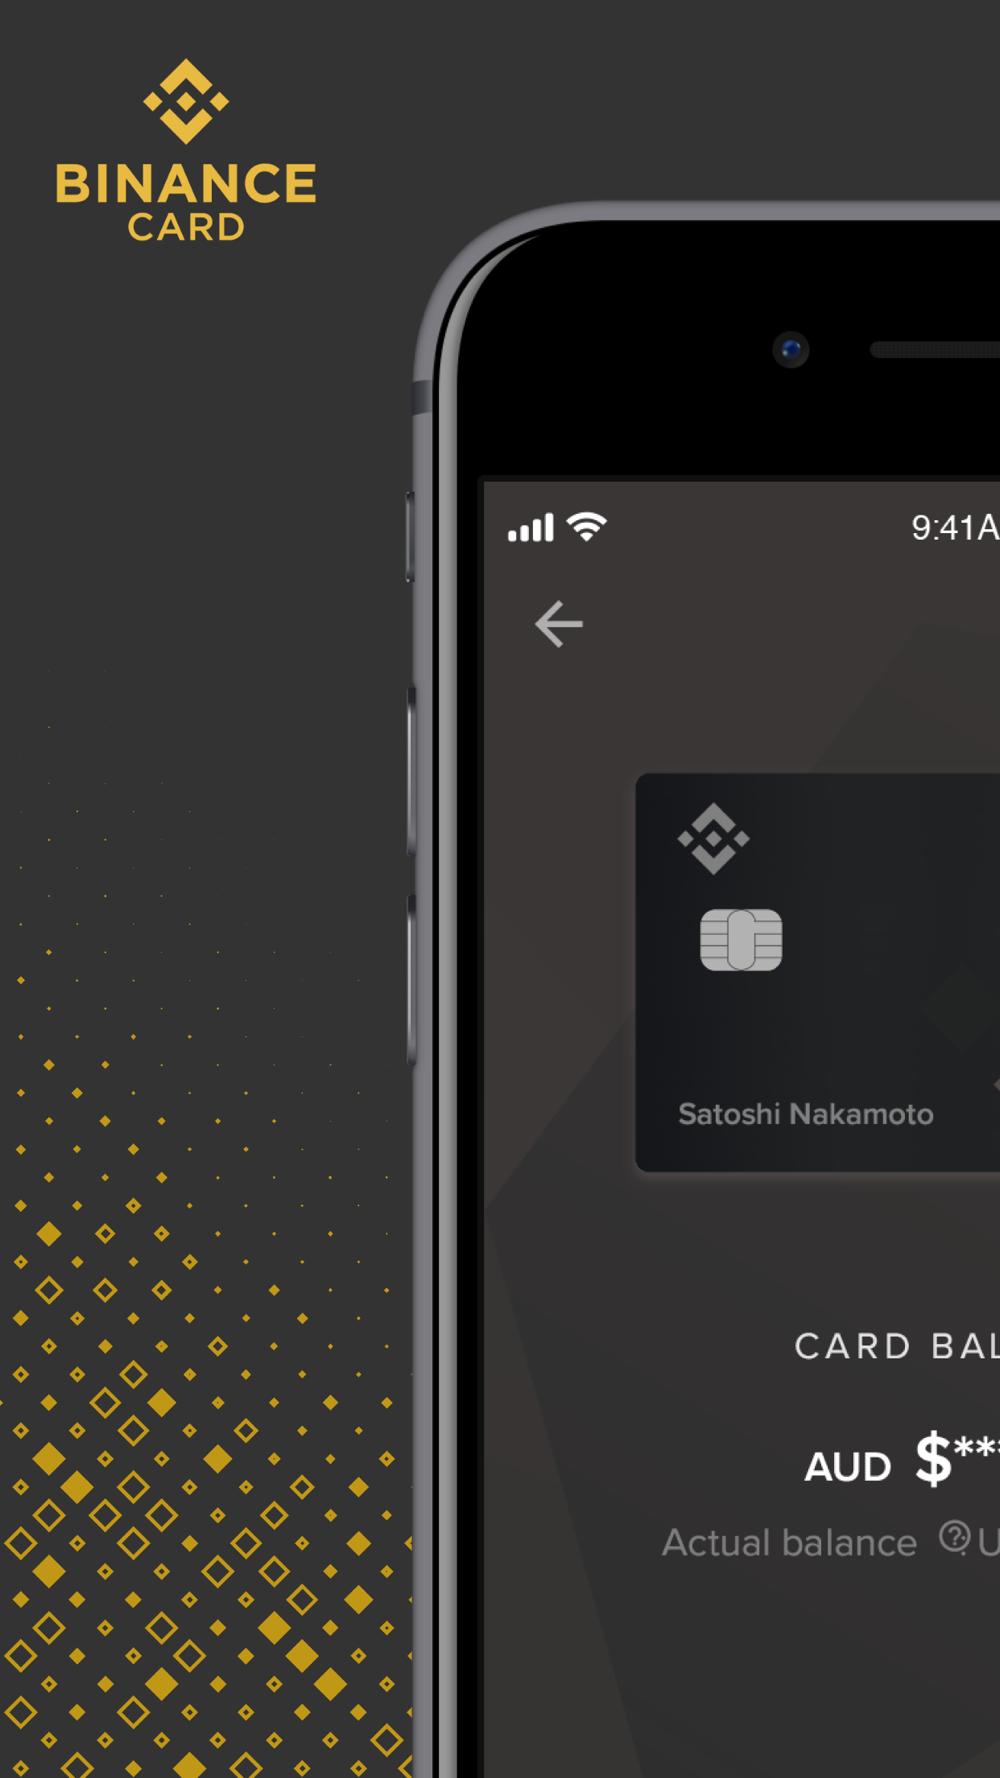 binance card app